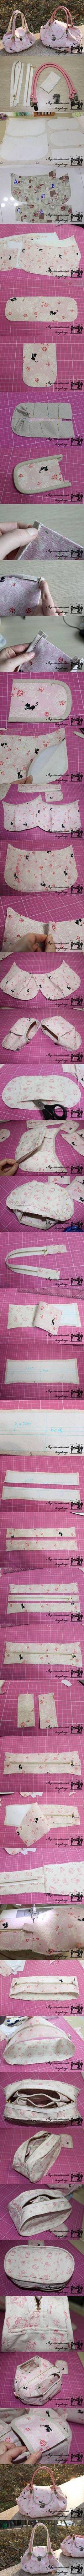 DIY Sew Cute Handbag diy craft crafts craft ideas diy ideas diy crafts how to tutorial diy accessories fashion crafts craft handbag #diycrafts #diyhandbag